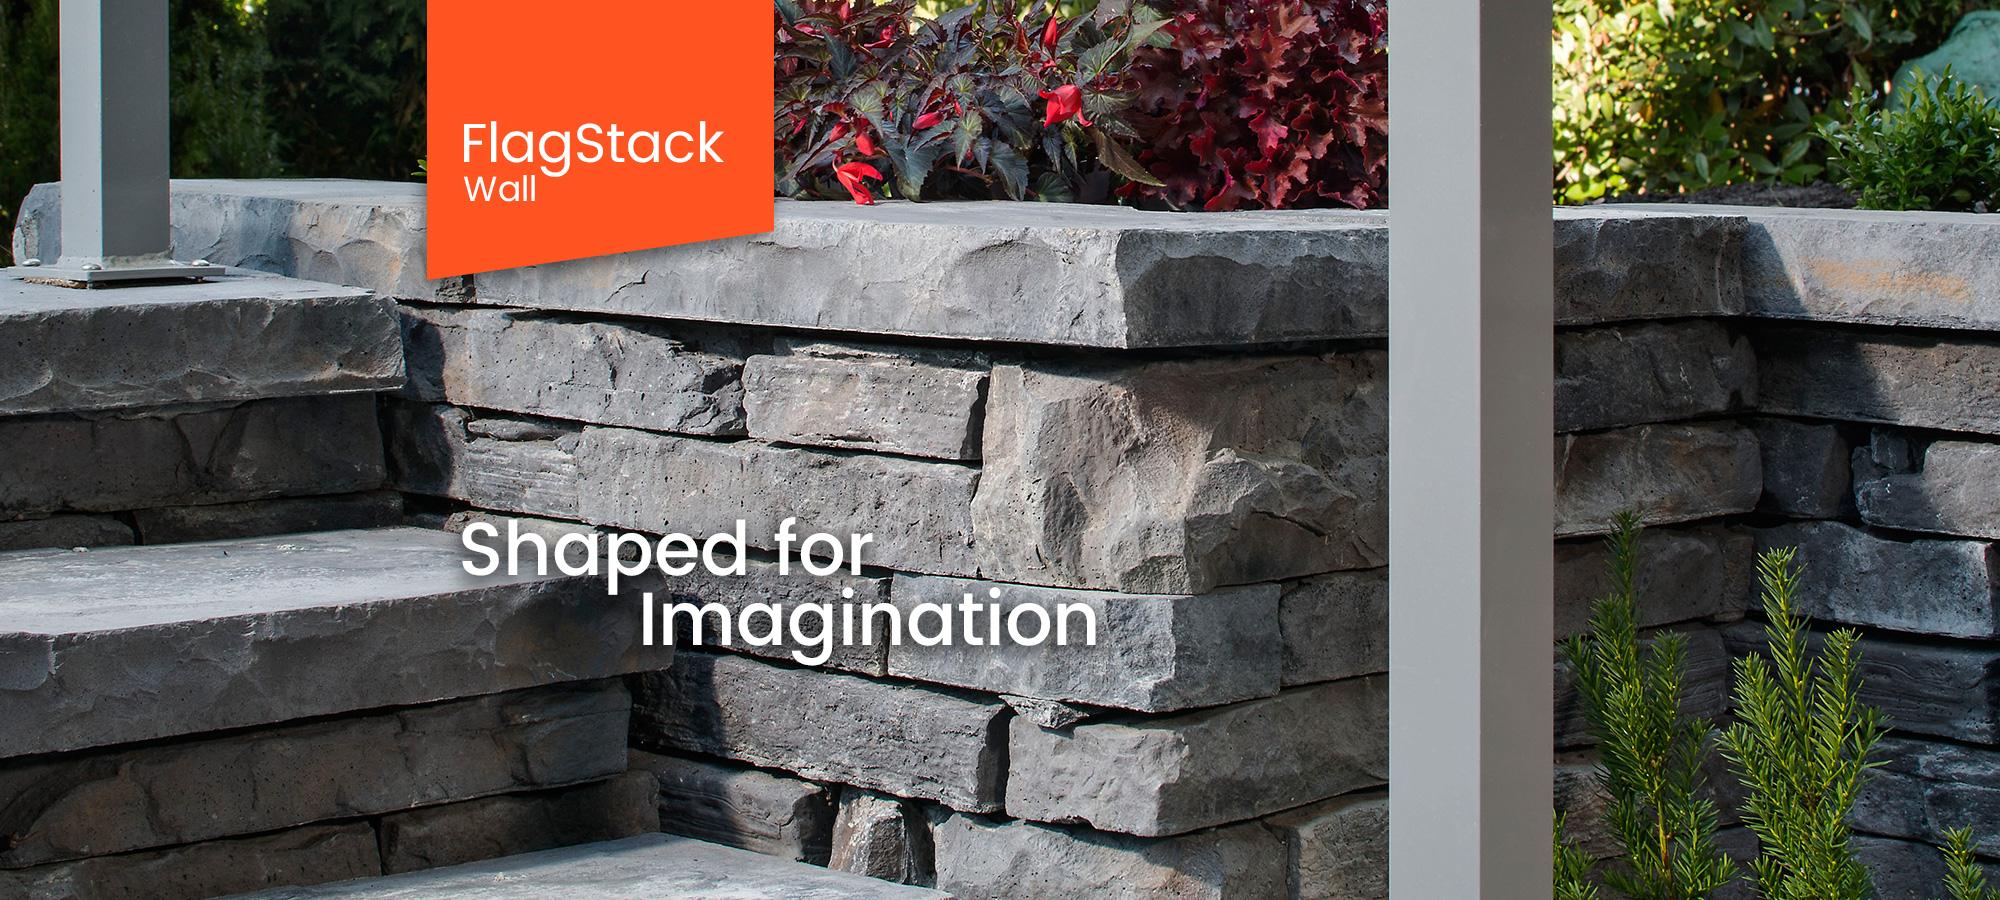 FlagStack Wall